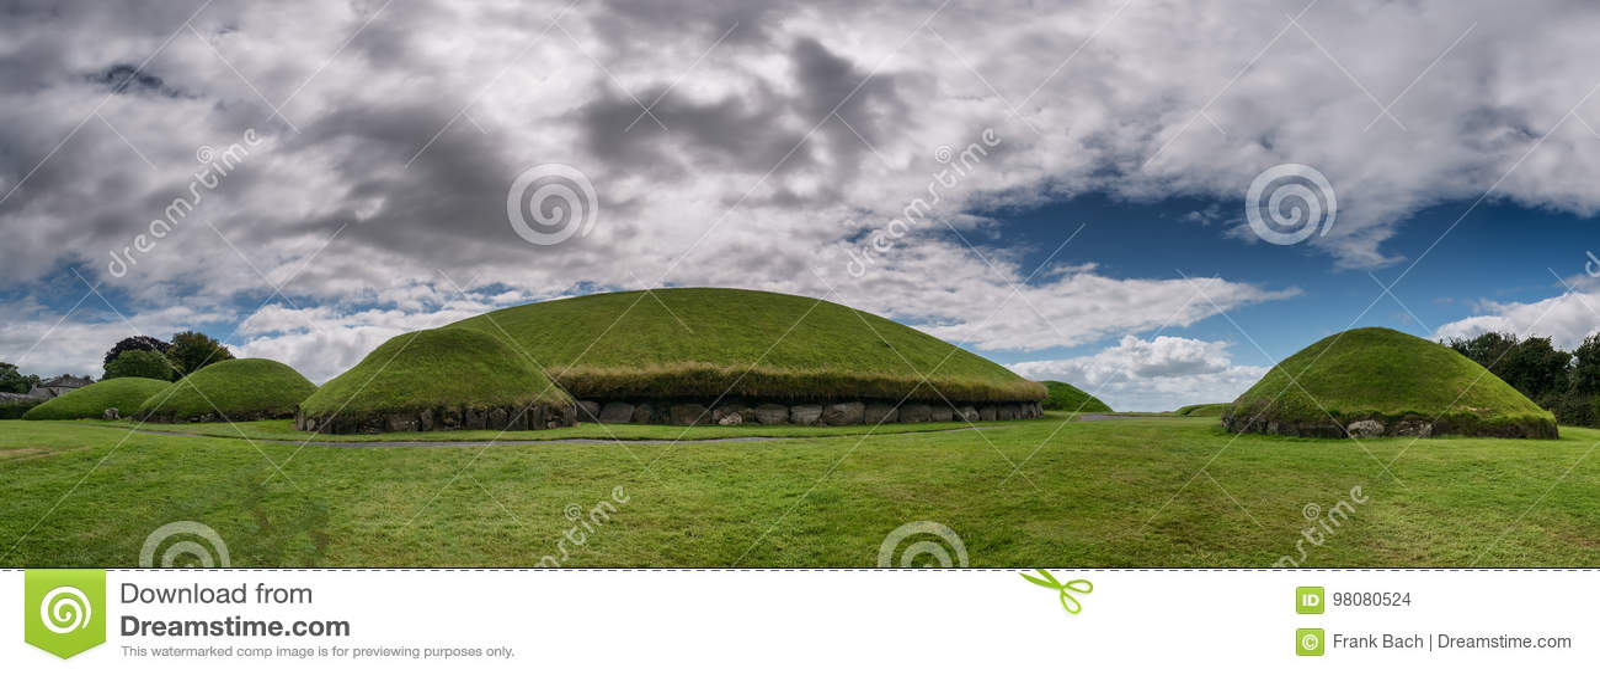 Knowth新石器时代的段落坟茔,主要土墩在爱尔兰